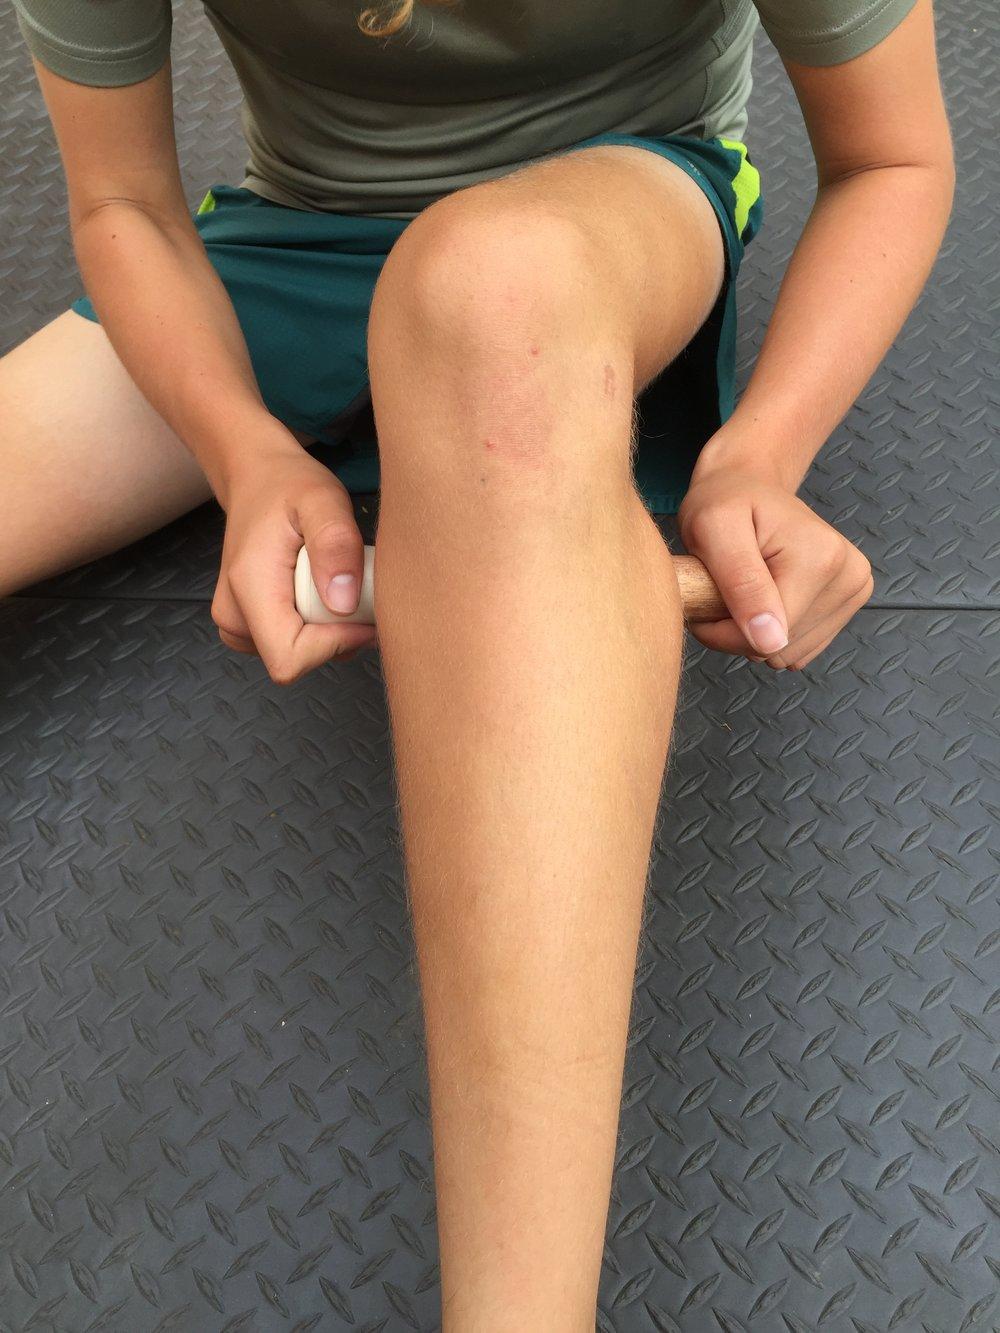 basecampcalfmassage